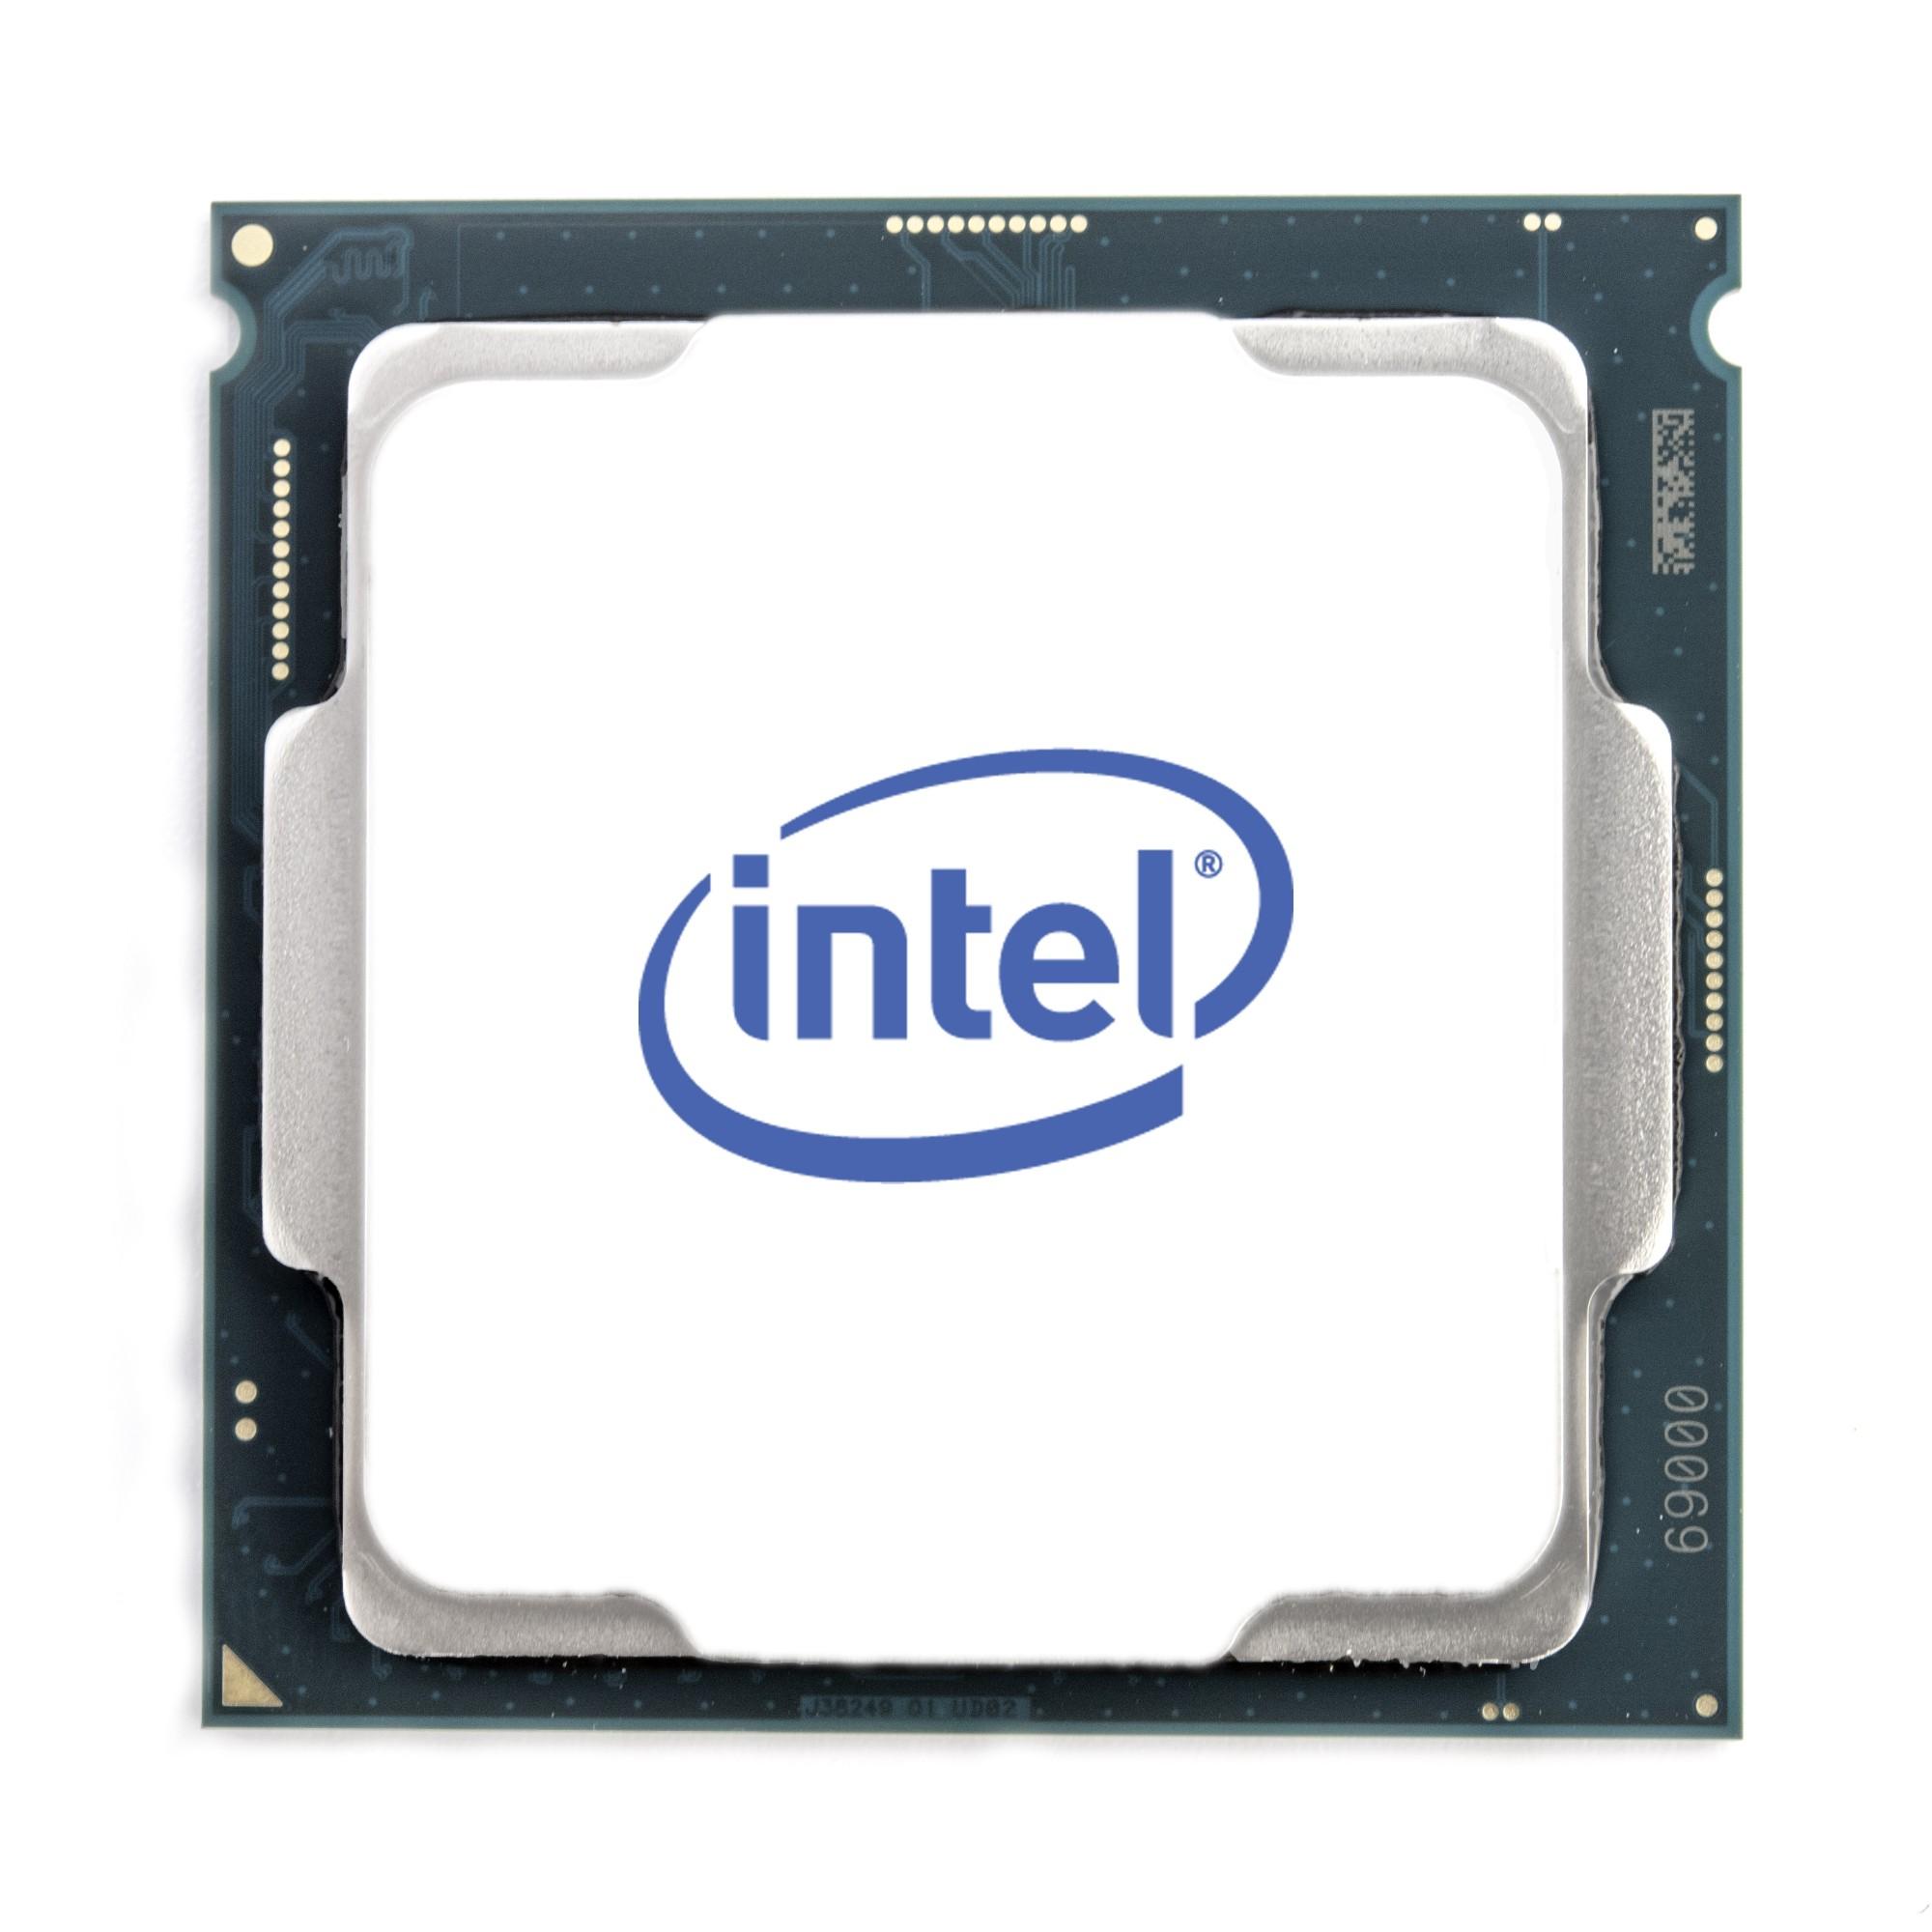 Intel Xeon 4214 processor 2.2 GHz 16.5 MB